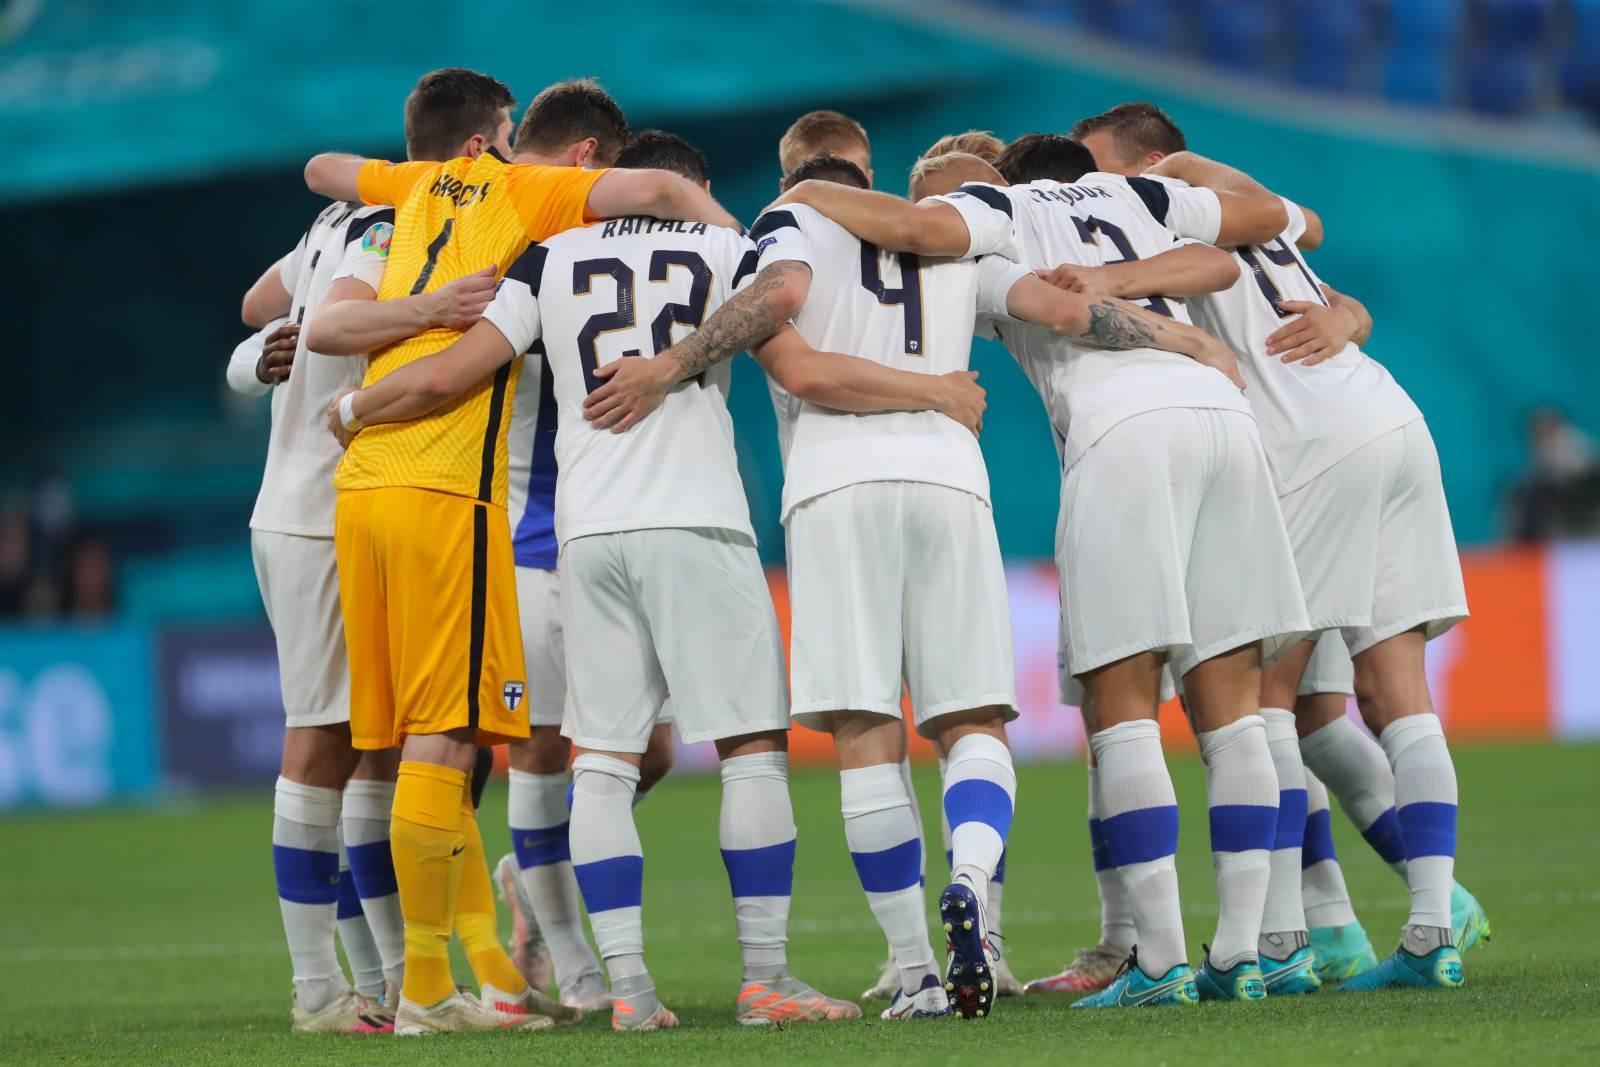 Финляндия - Казахстан - 1:0 (завершён)